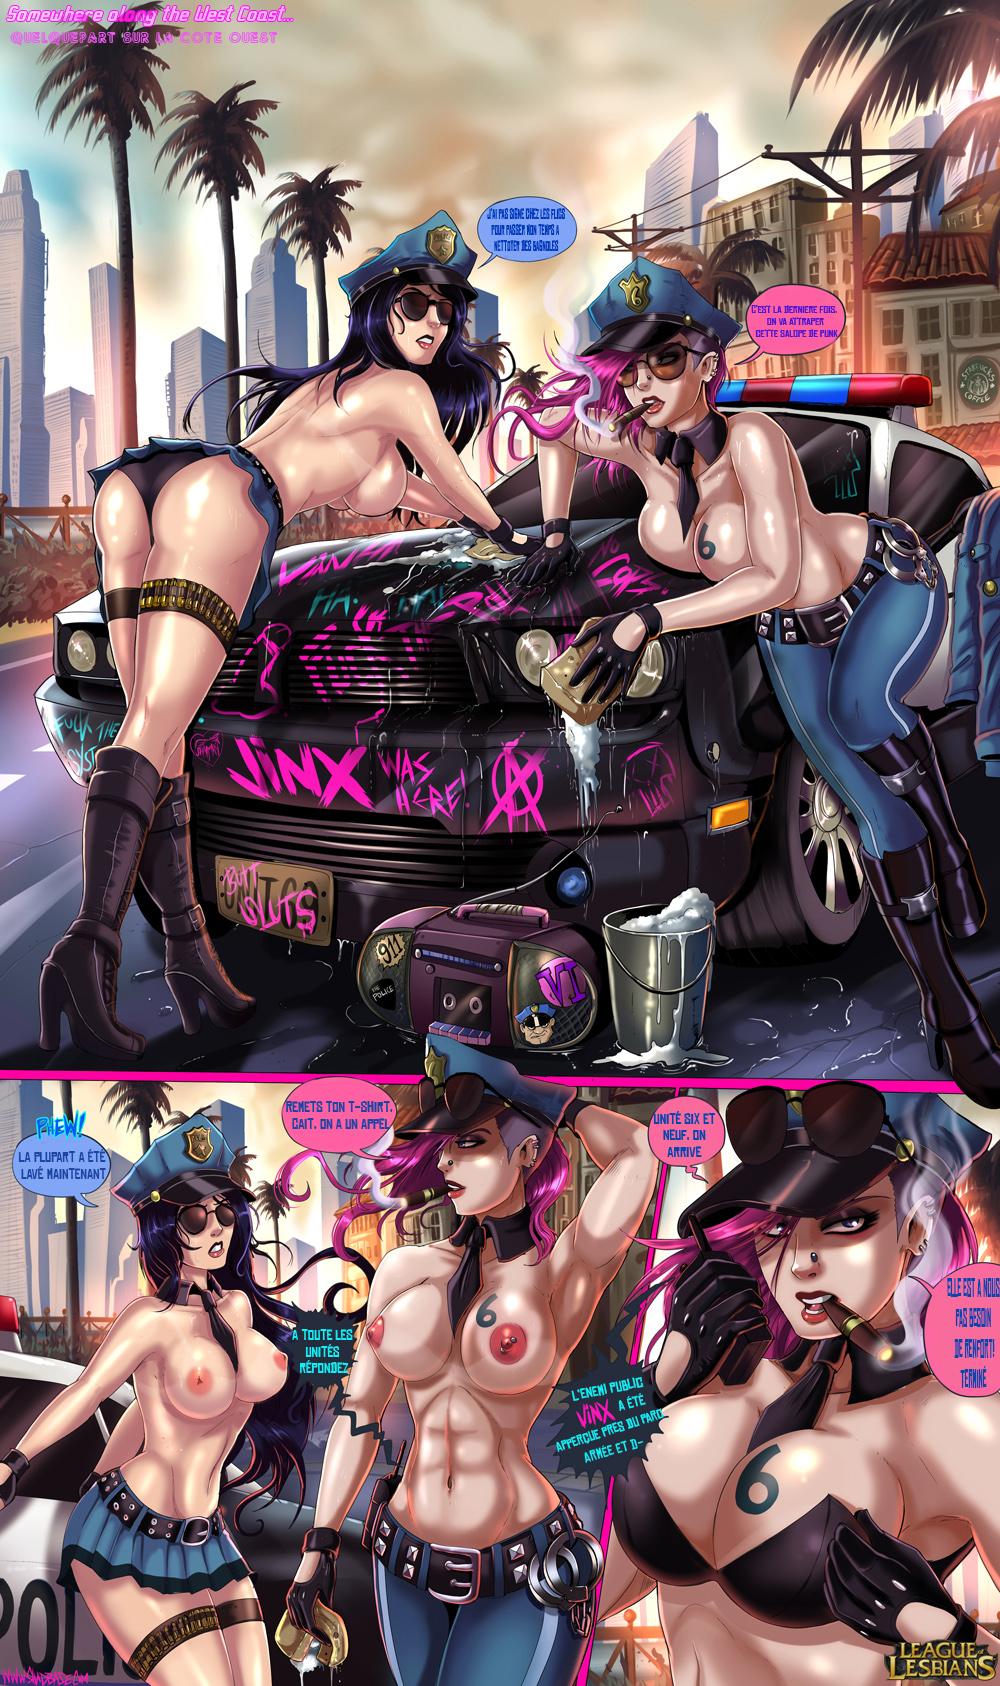 League of legends lesbians sex sexy galleries